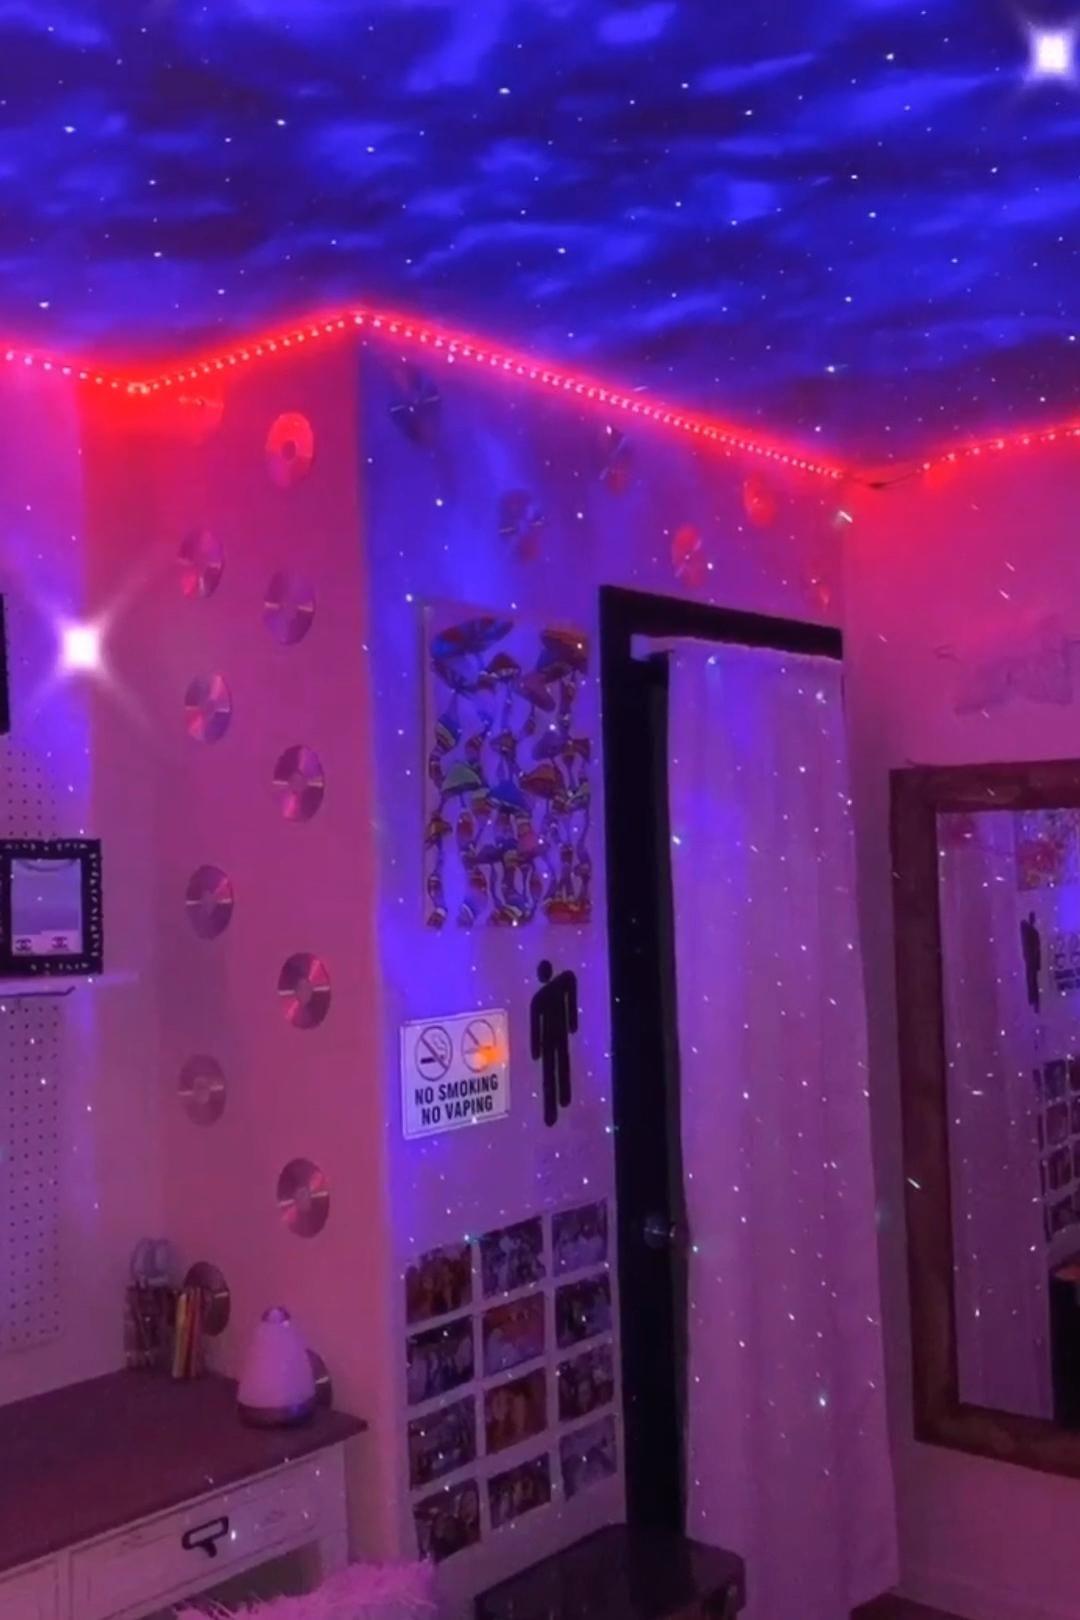 Galaxy Nebula Starry Room Decor